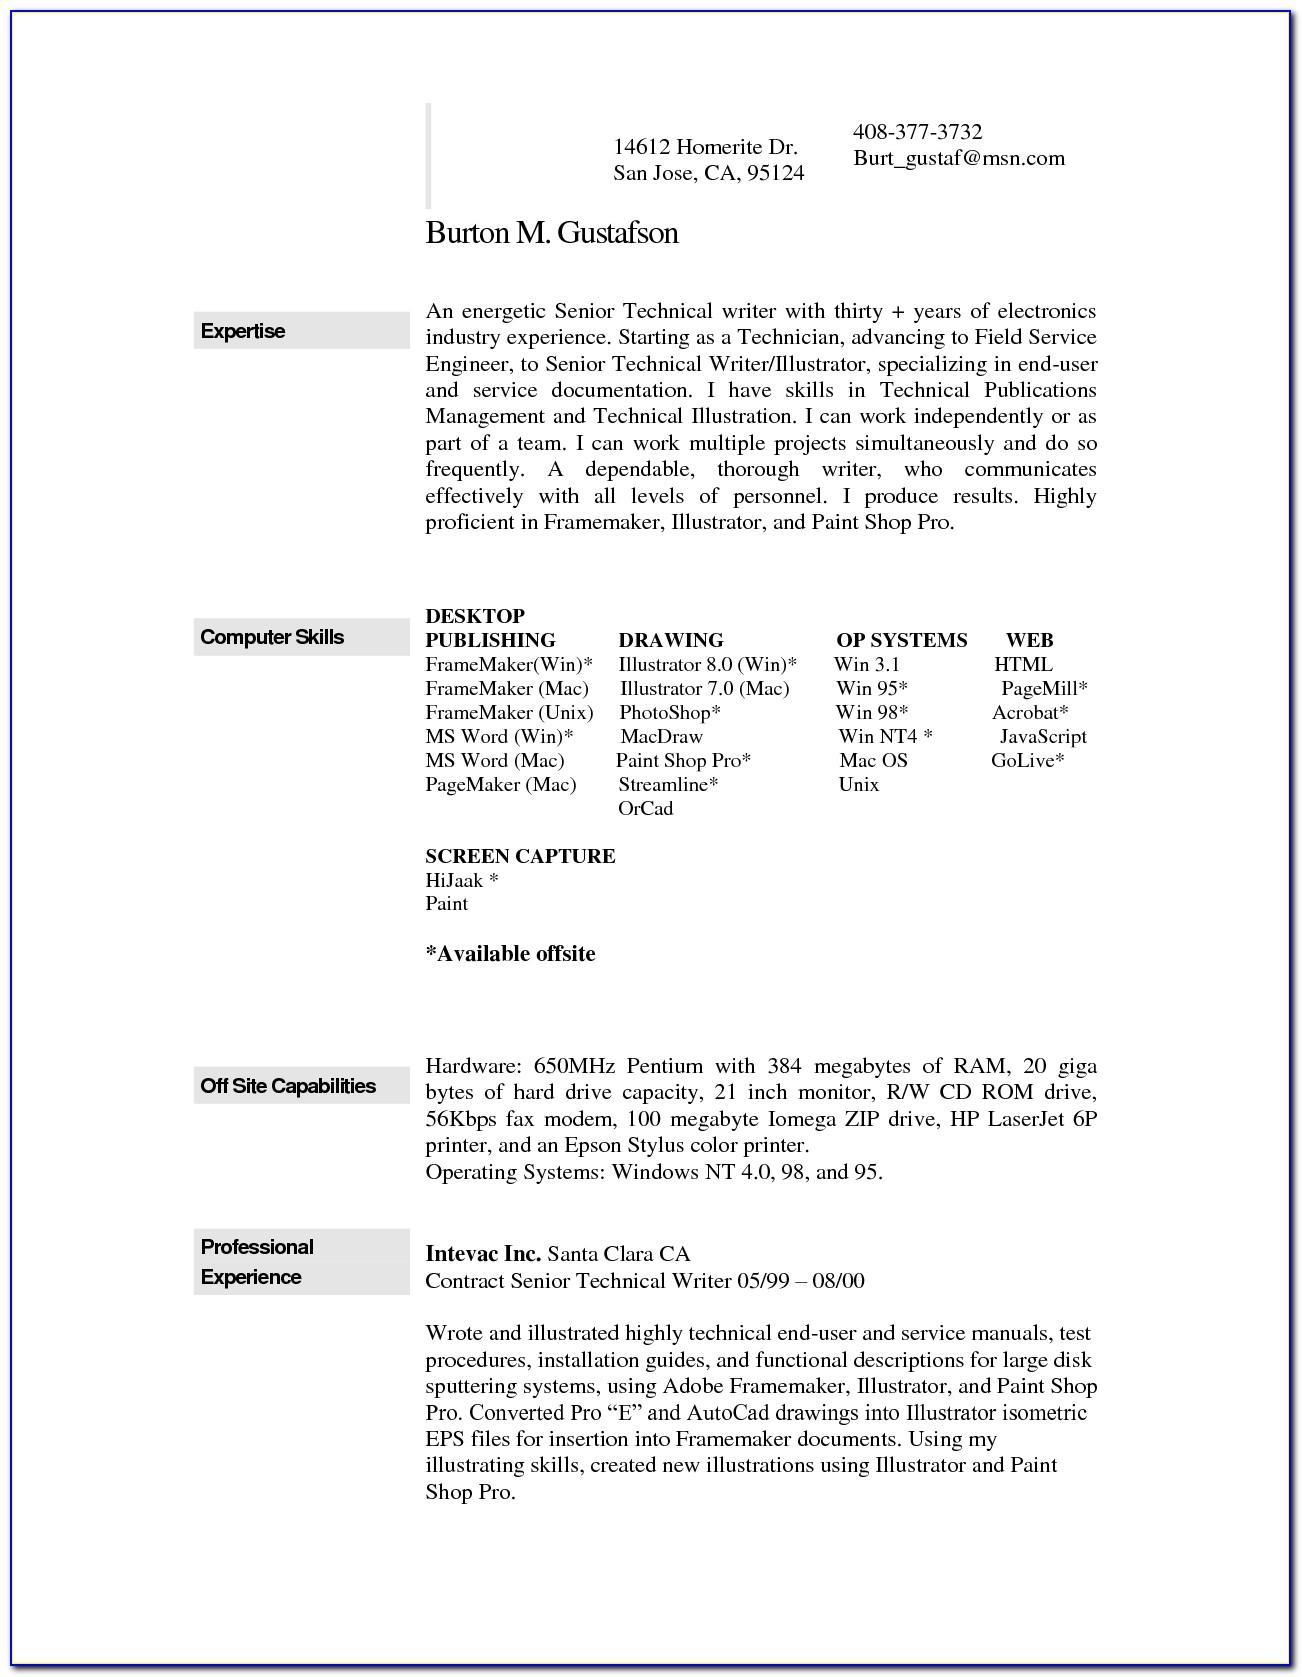 Resume Format Ms Word File Download